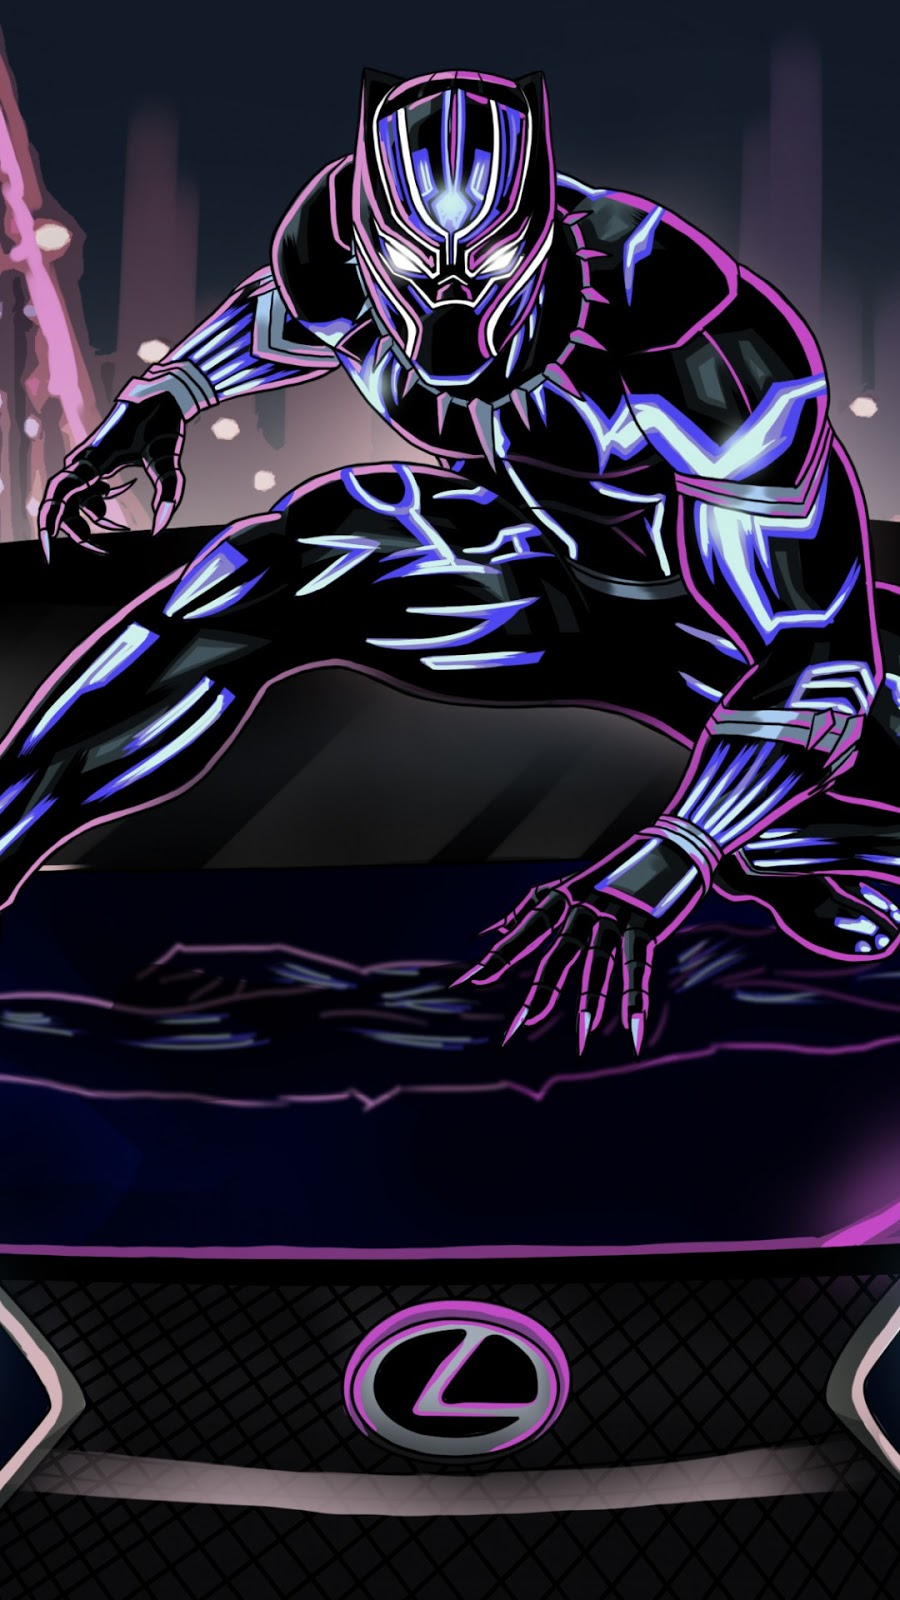 Papel de parede grátis Pantera Negra Lexus LC 500 para PC, Notebook, iPhone, Android e Tablet.